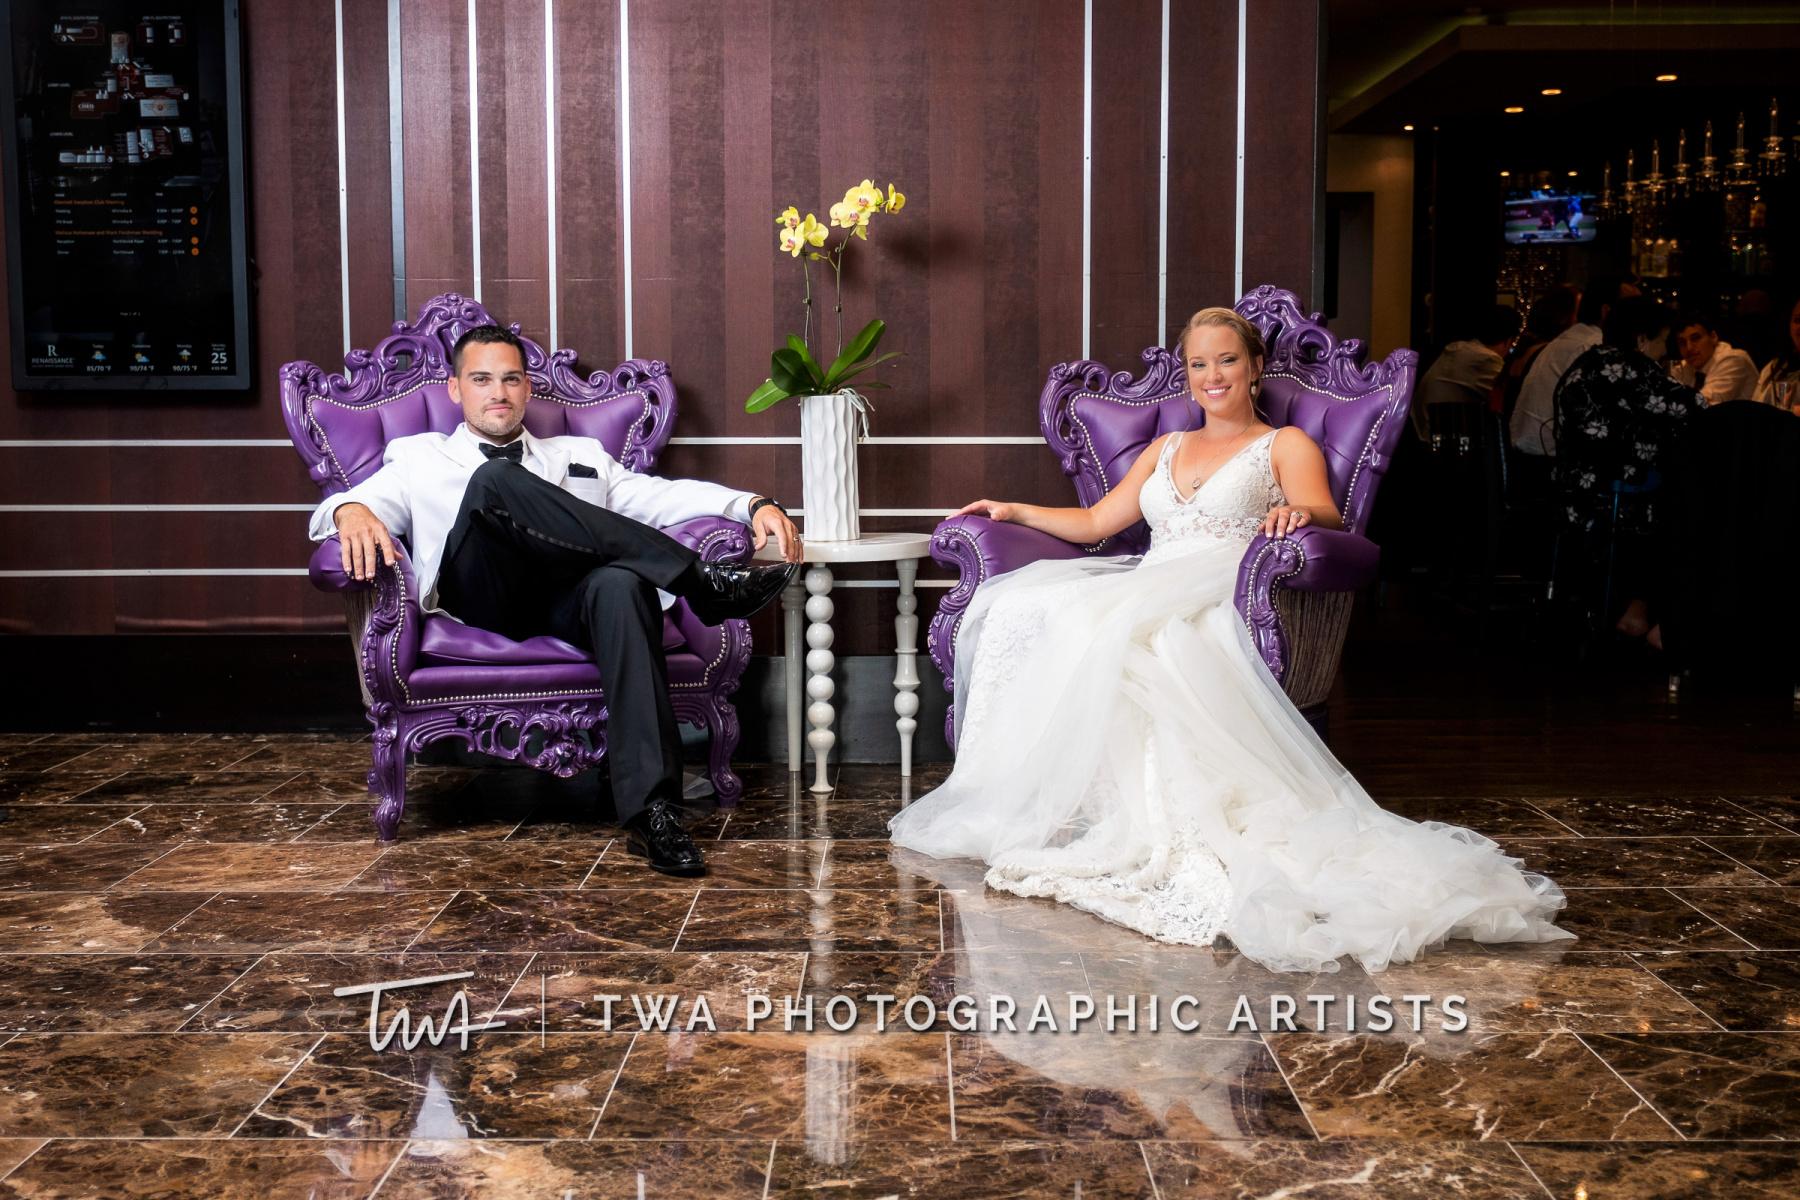 Chicago-Wedding-Photographers-Renaissance-Hotel_Hohensee_Fleishman_JG_DK-065-0399